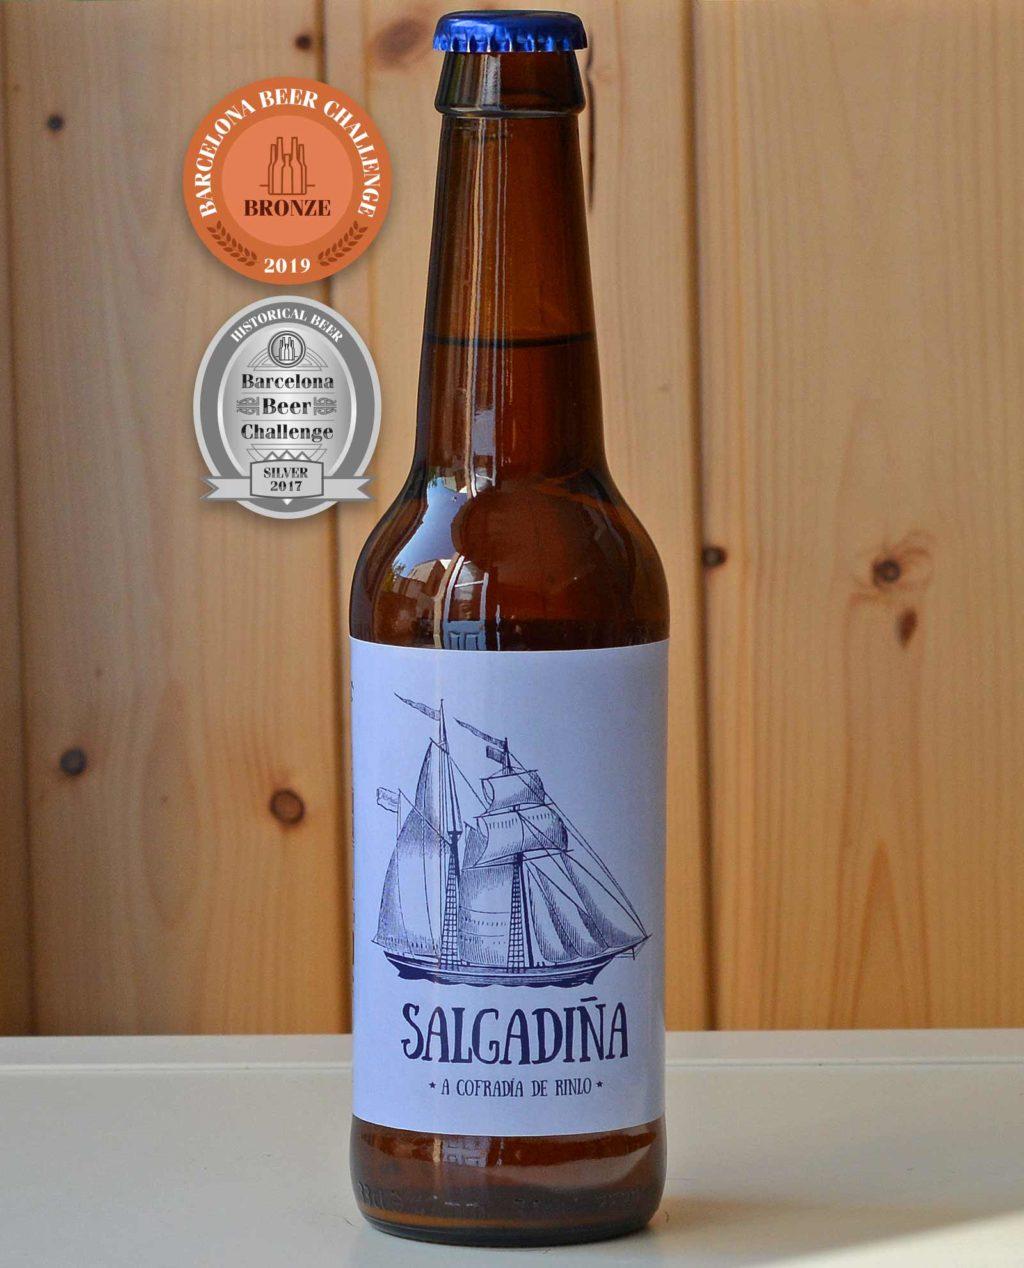 aloumina-cerveza-artesana-craft-beer-lugo-galicia-salgadina-cofradiaderinlo-gose-bbc-barcelonabeerchallenge-historicalbeer